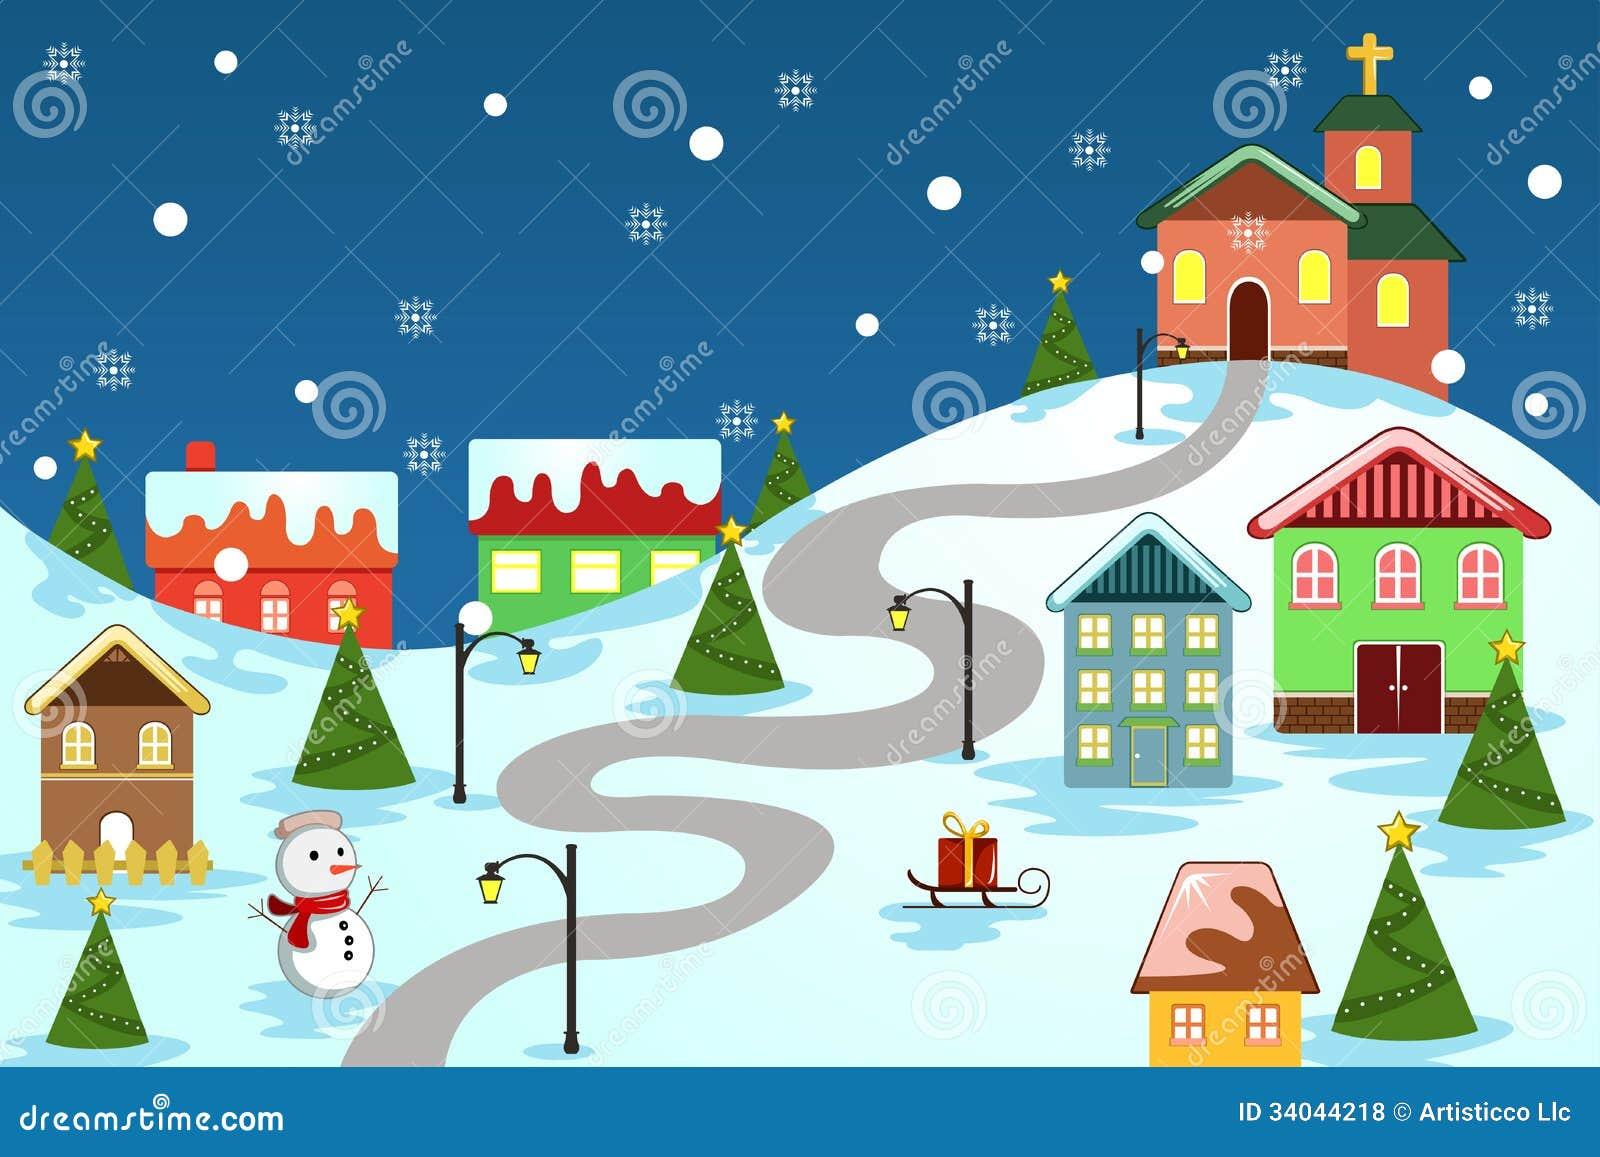 Town Landscape Vector Illustration: Winter Village Stock Vector. Illustration Of Rural